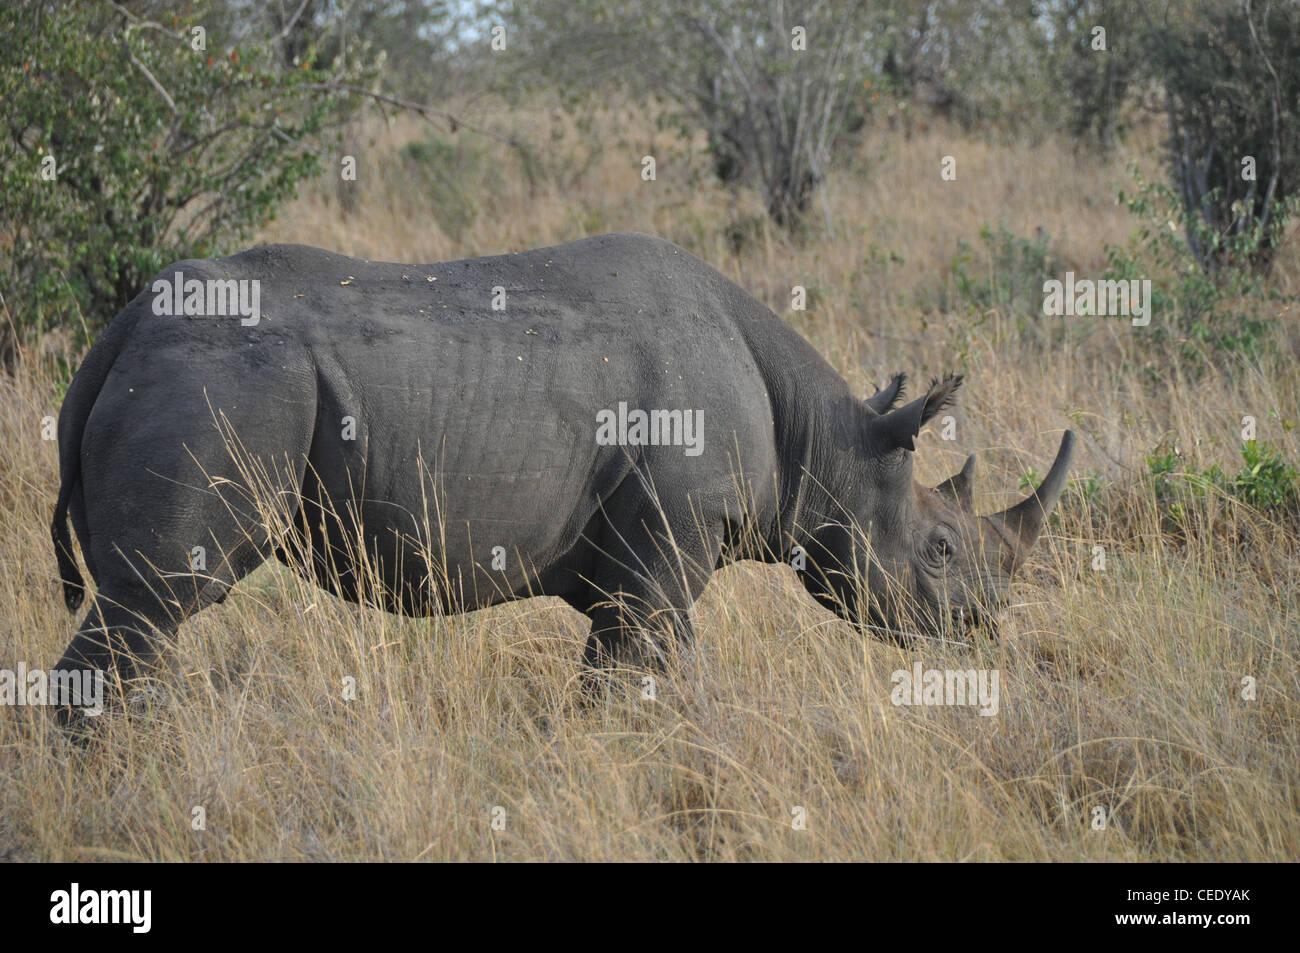 Rhinoceros in the Savanna - Stock Image